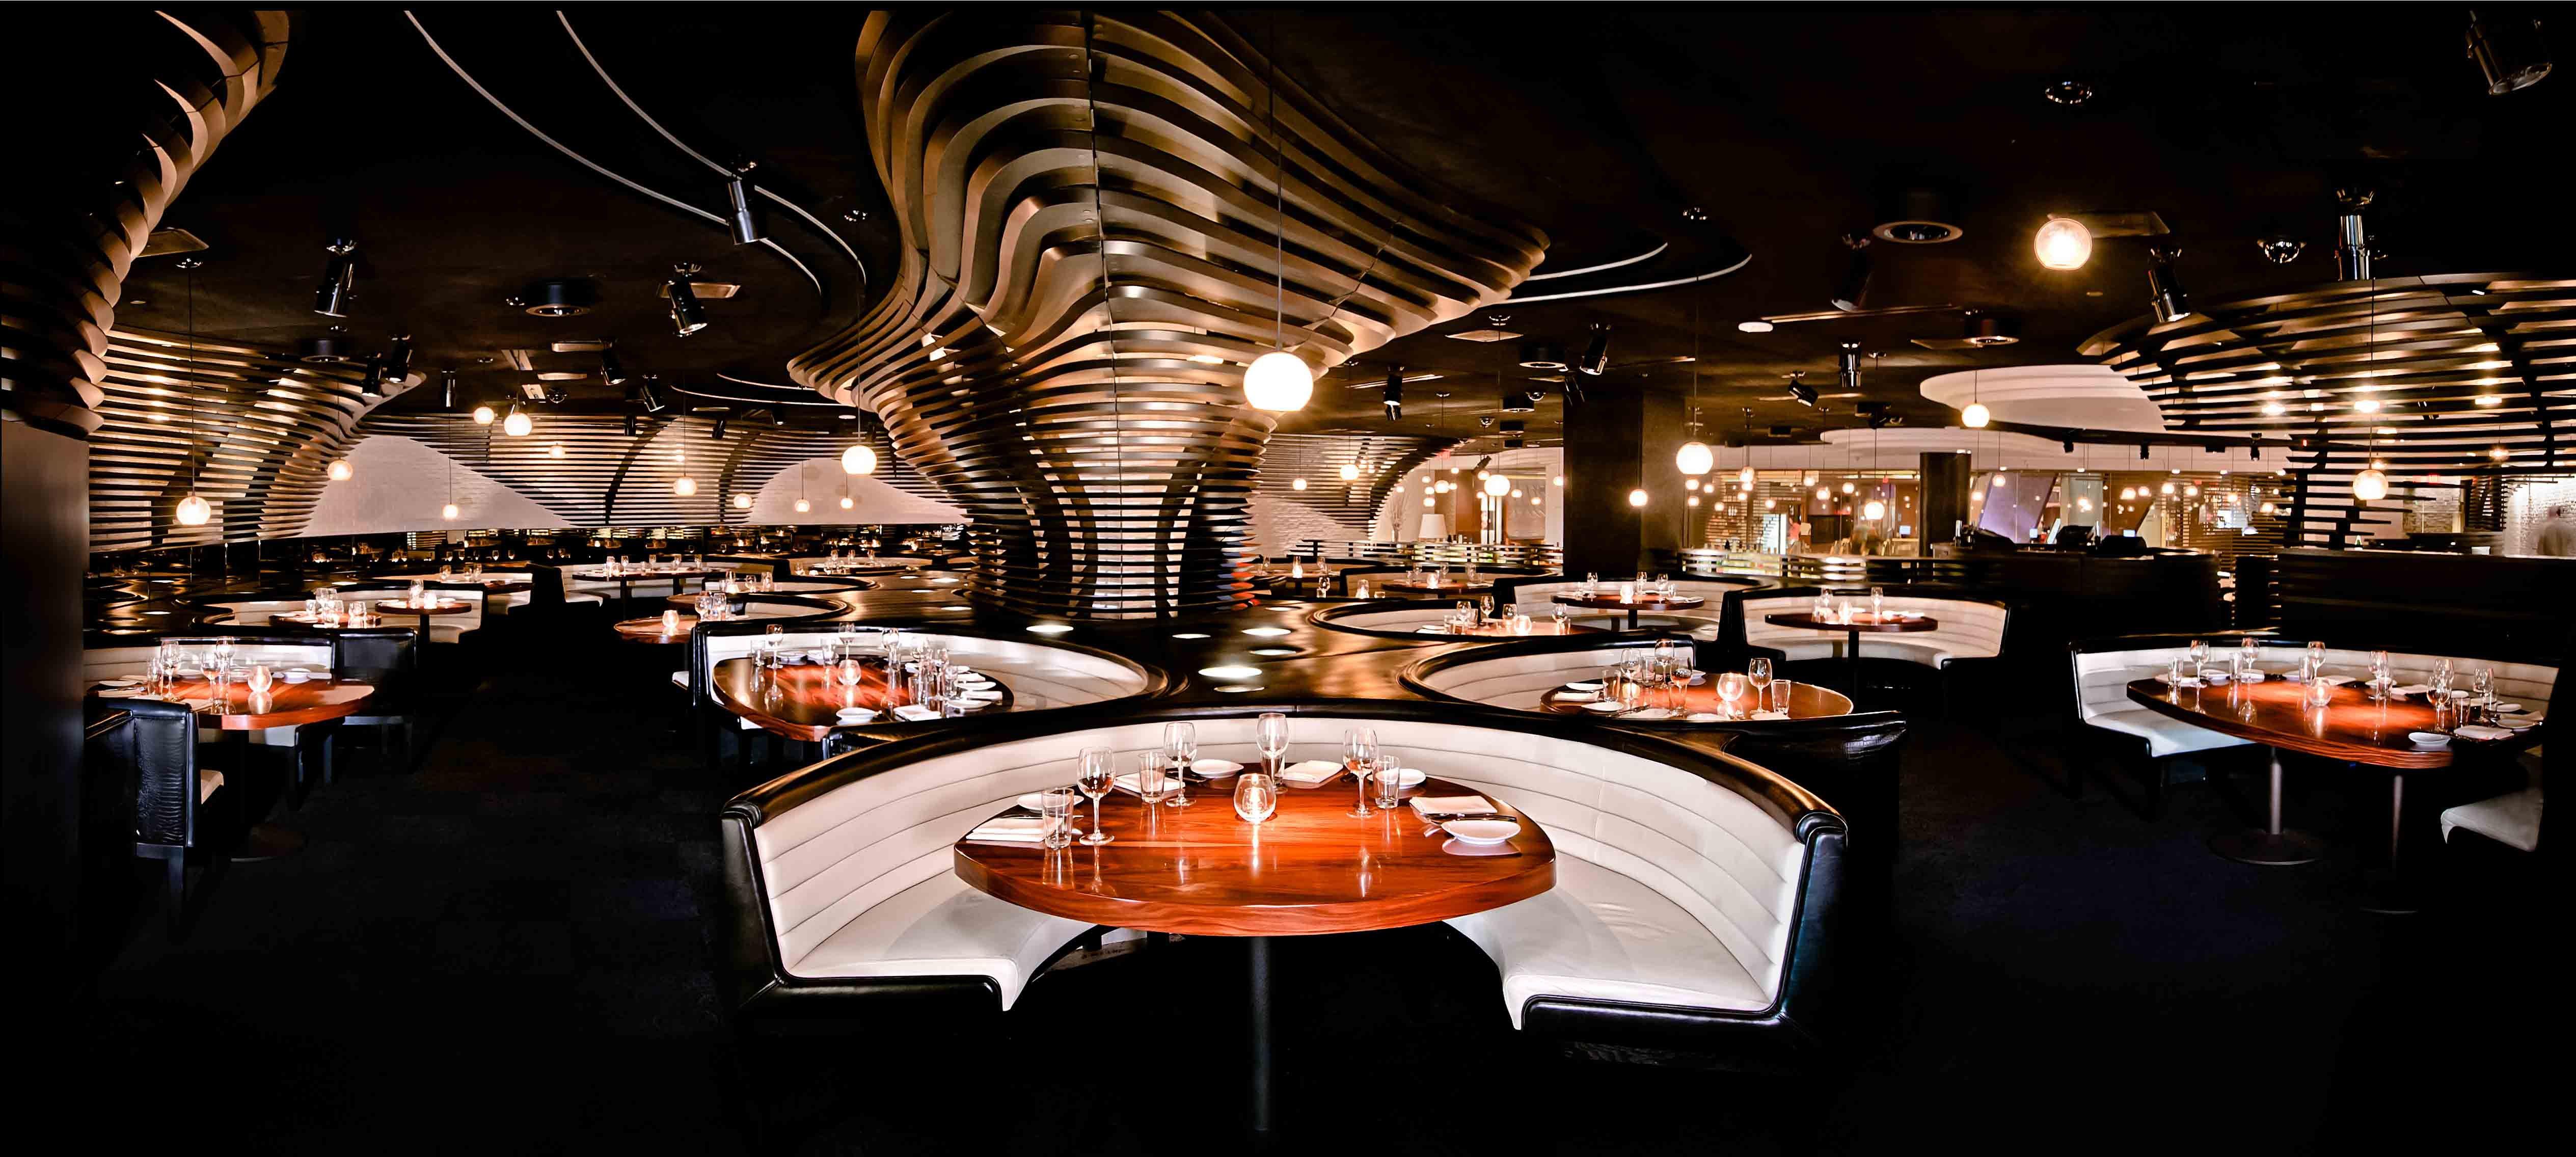 Explore Restaurant Interiors Bar And More